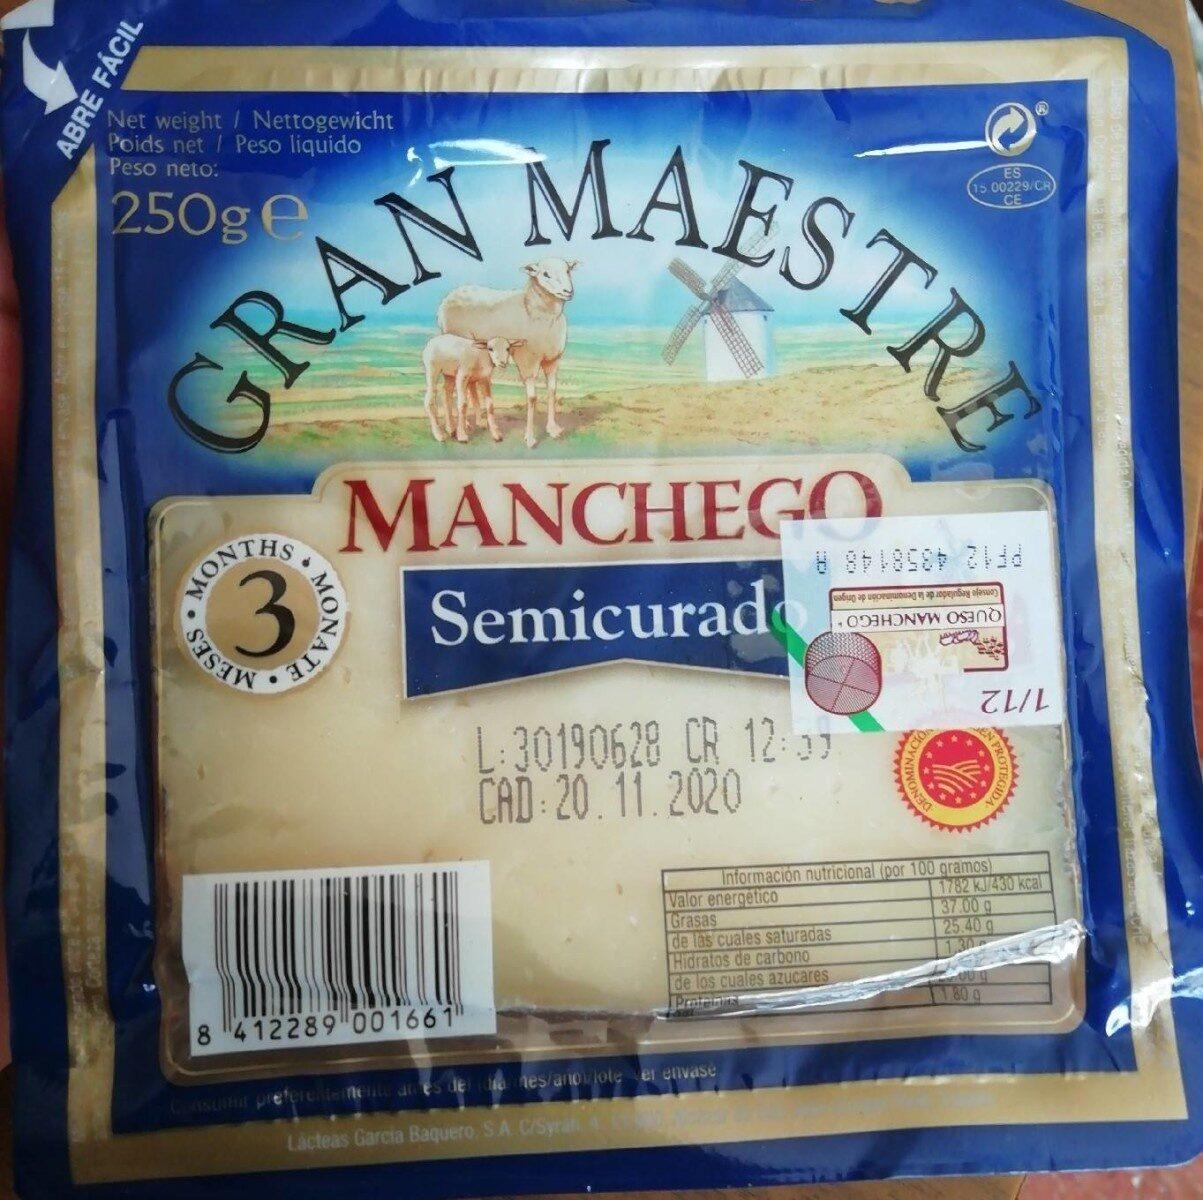 Manchego semi curado - Producte - fr